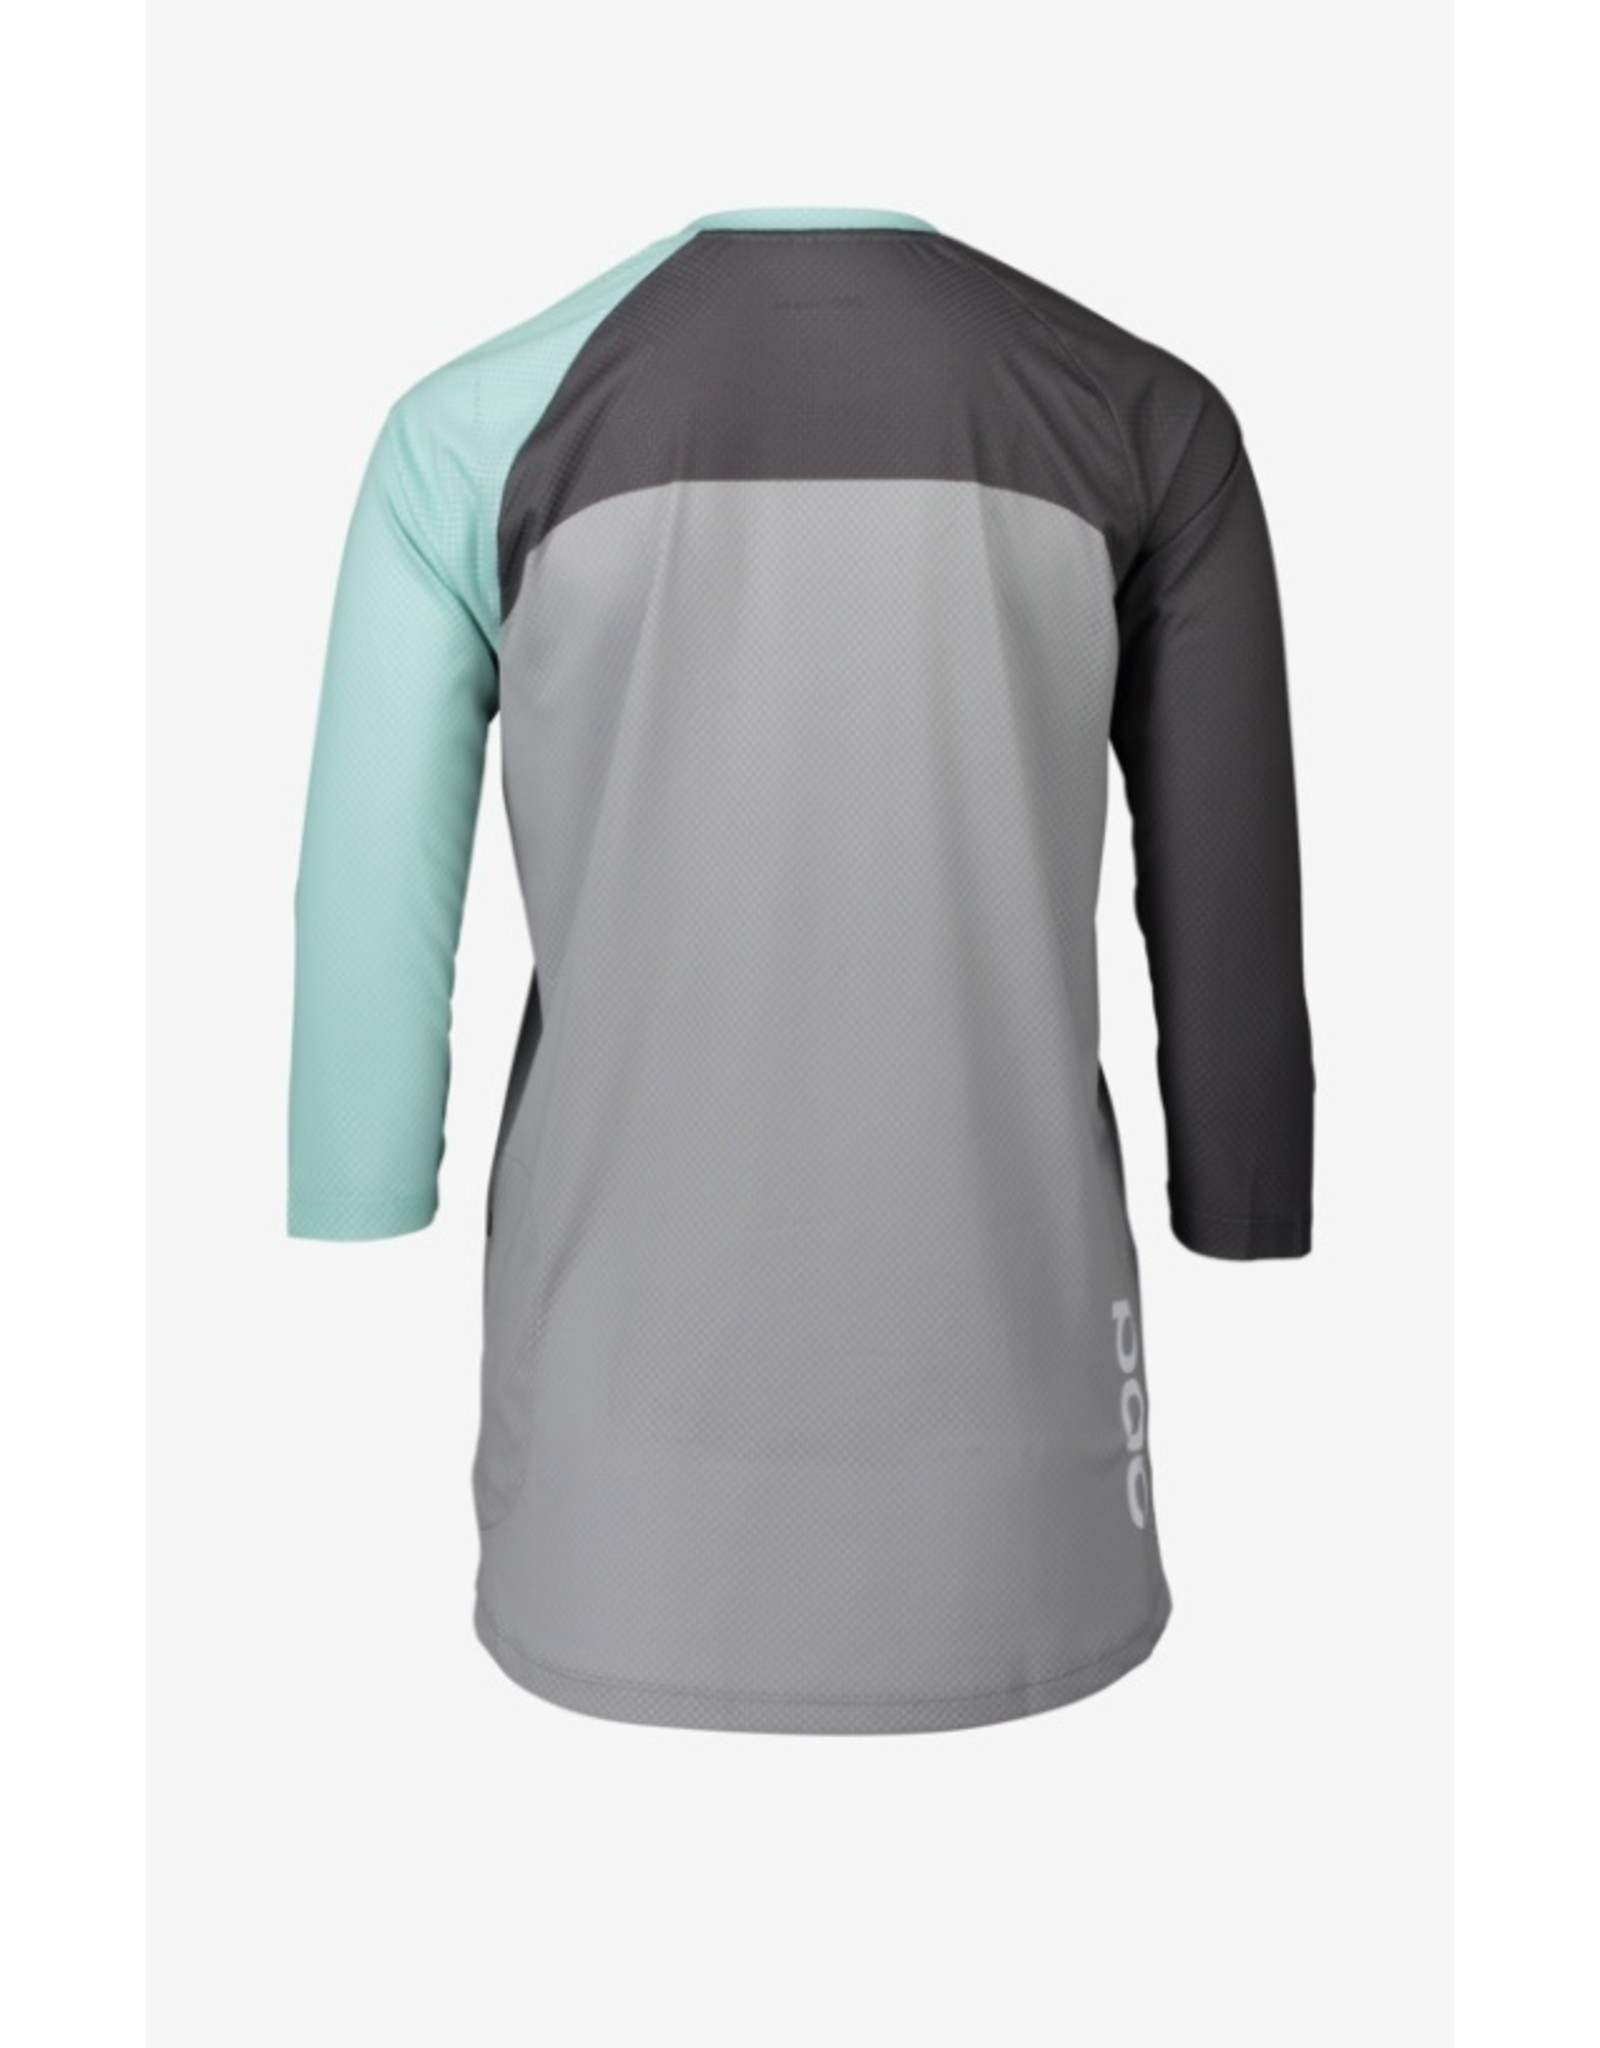 POC POC MTB Pure 3/4 Women's Jersey Lt Fluorite Green/Sylvanite Grey/Alloy Grey